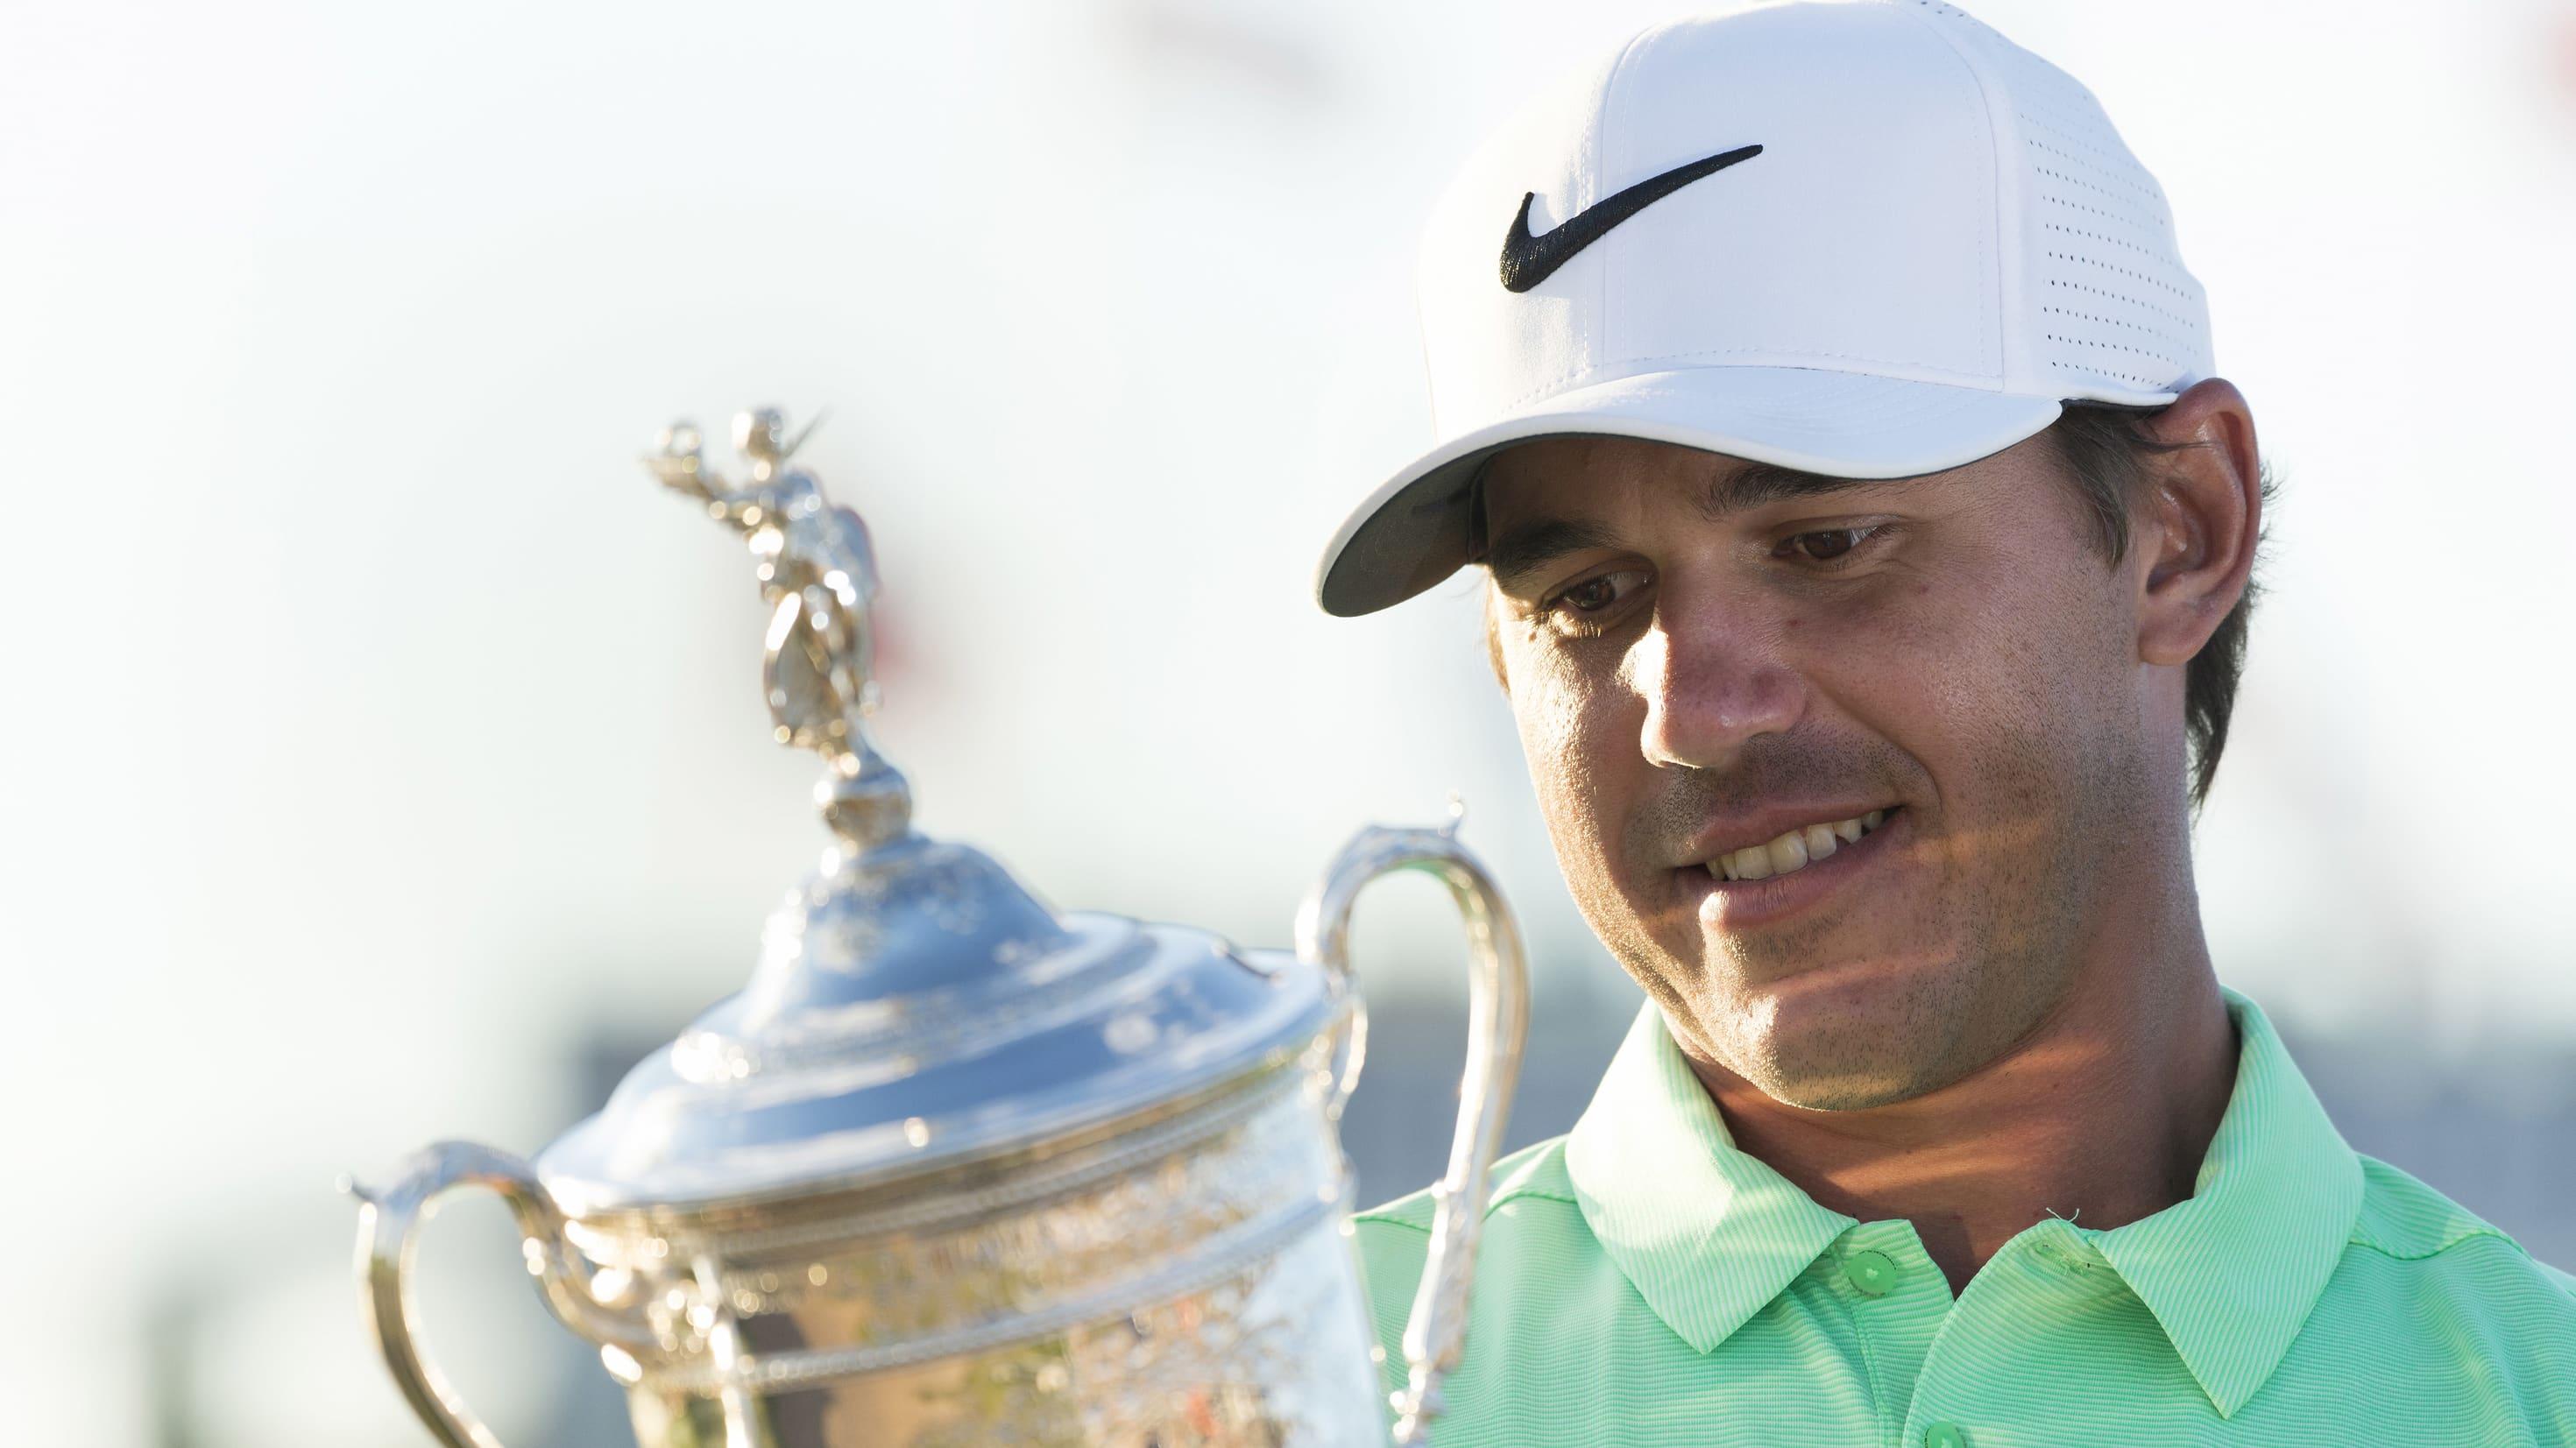 a6c1c273e91e4 Brooks Koepka added his name to the illustrious list of U.S. Open champions  last June at Erin Hills. (USGA JD Cuban)